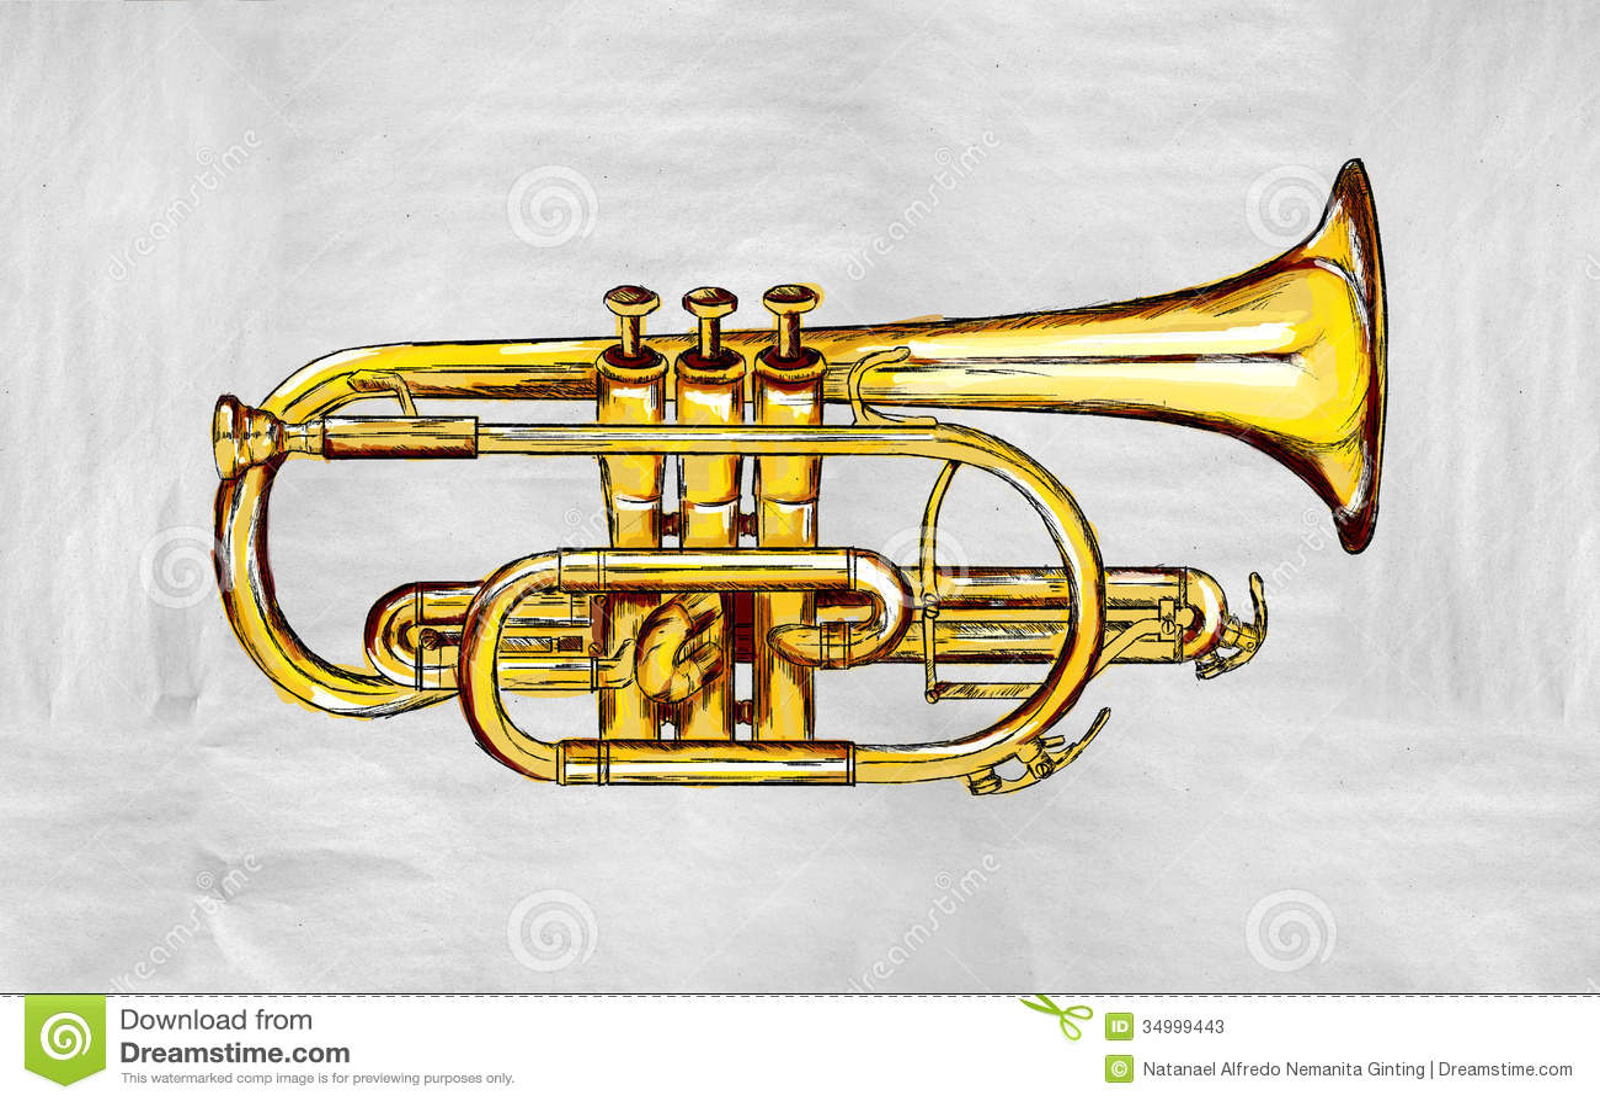 Trumpet Painting Image stock illustration. Illustration of musician ...